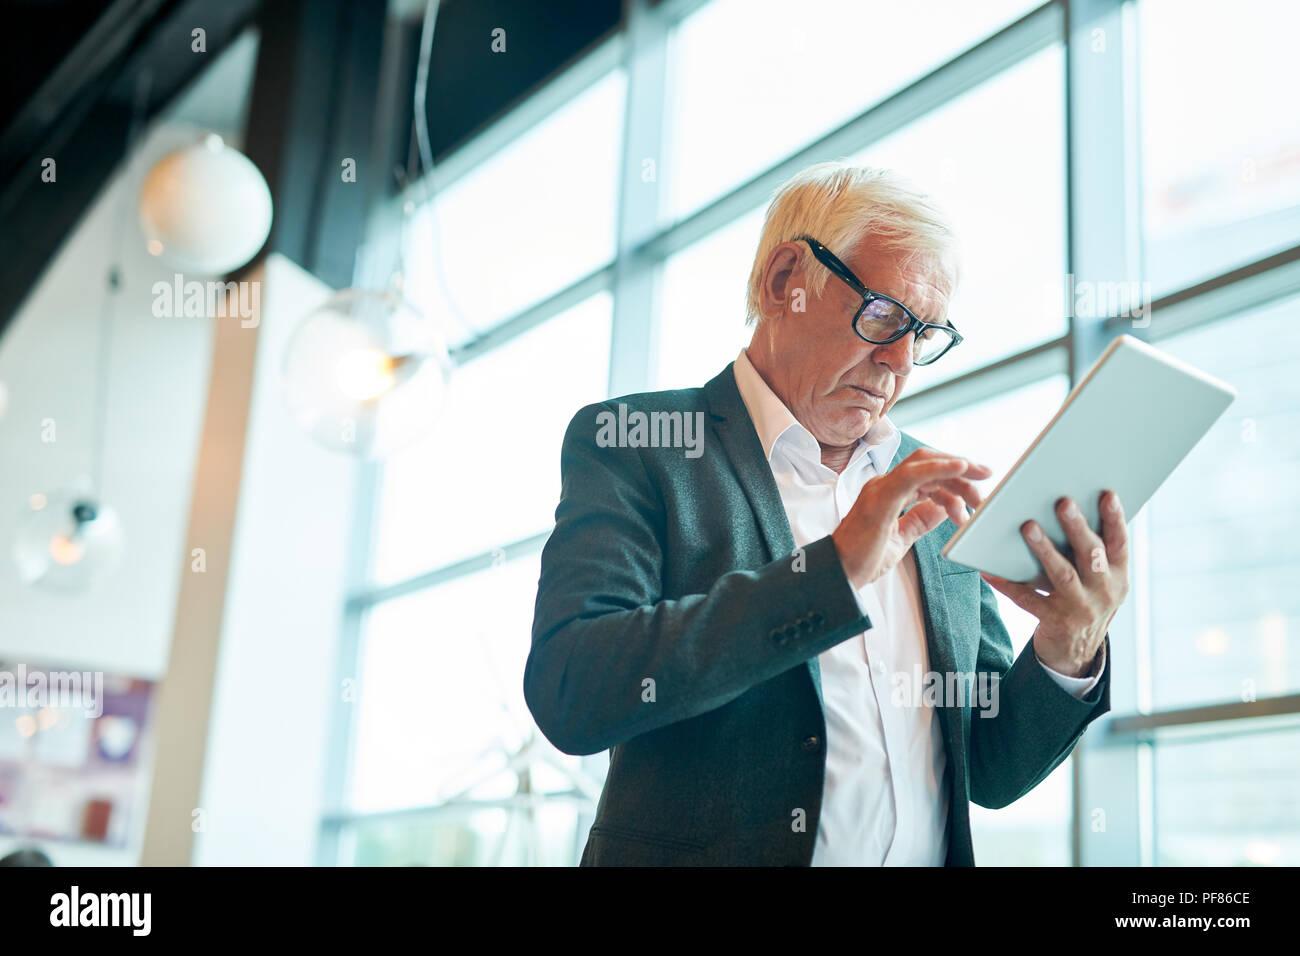 Senior Businessman Using Tablet Photo Stock